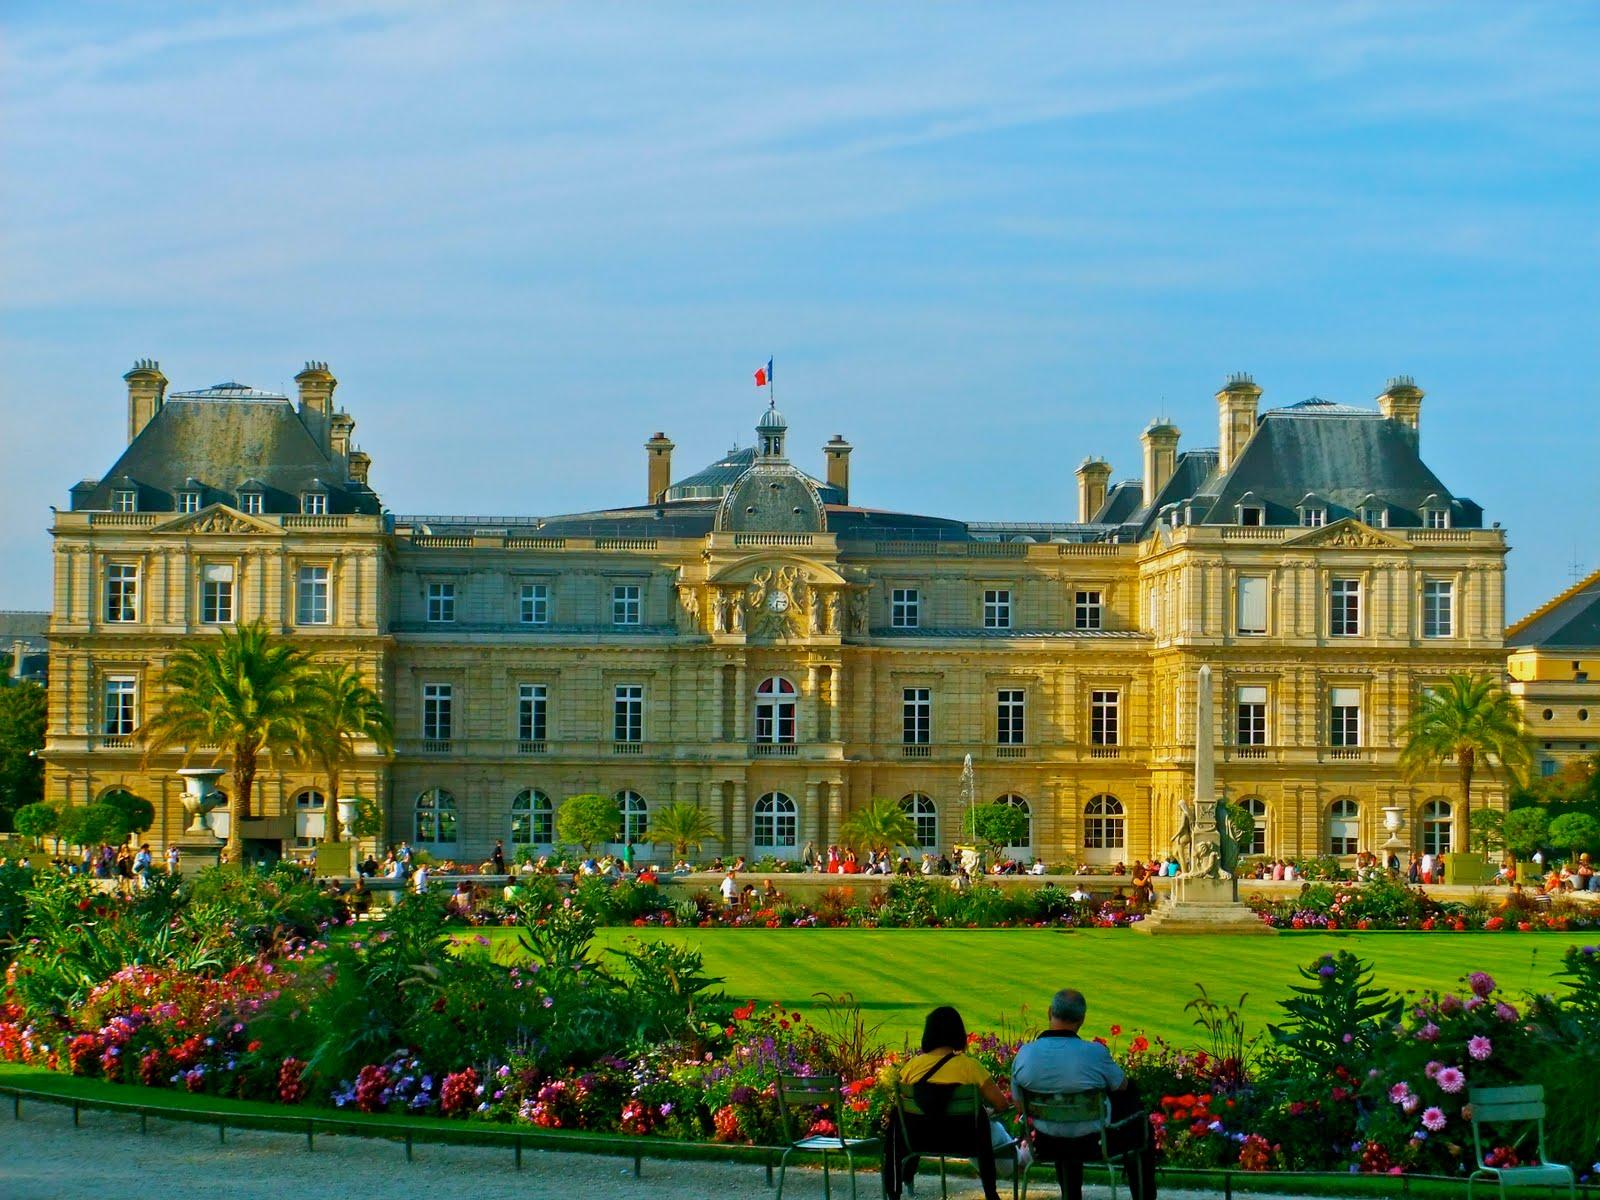 Jardin du luxembourg giardini di lussemburgo paris for Jardin jardin